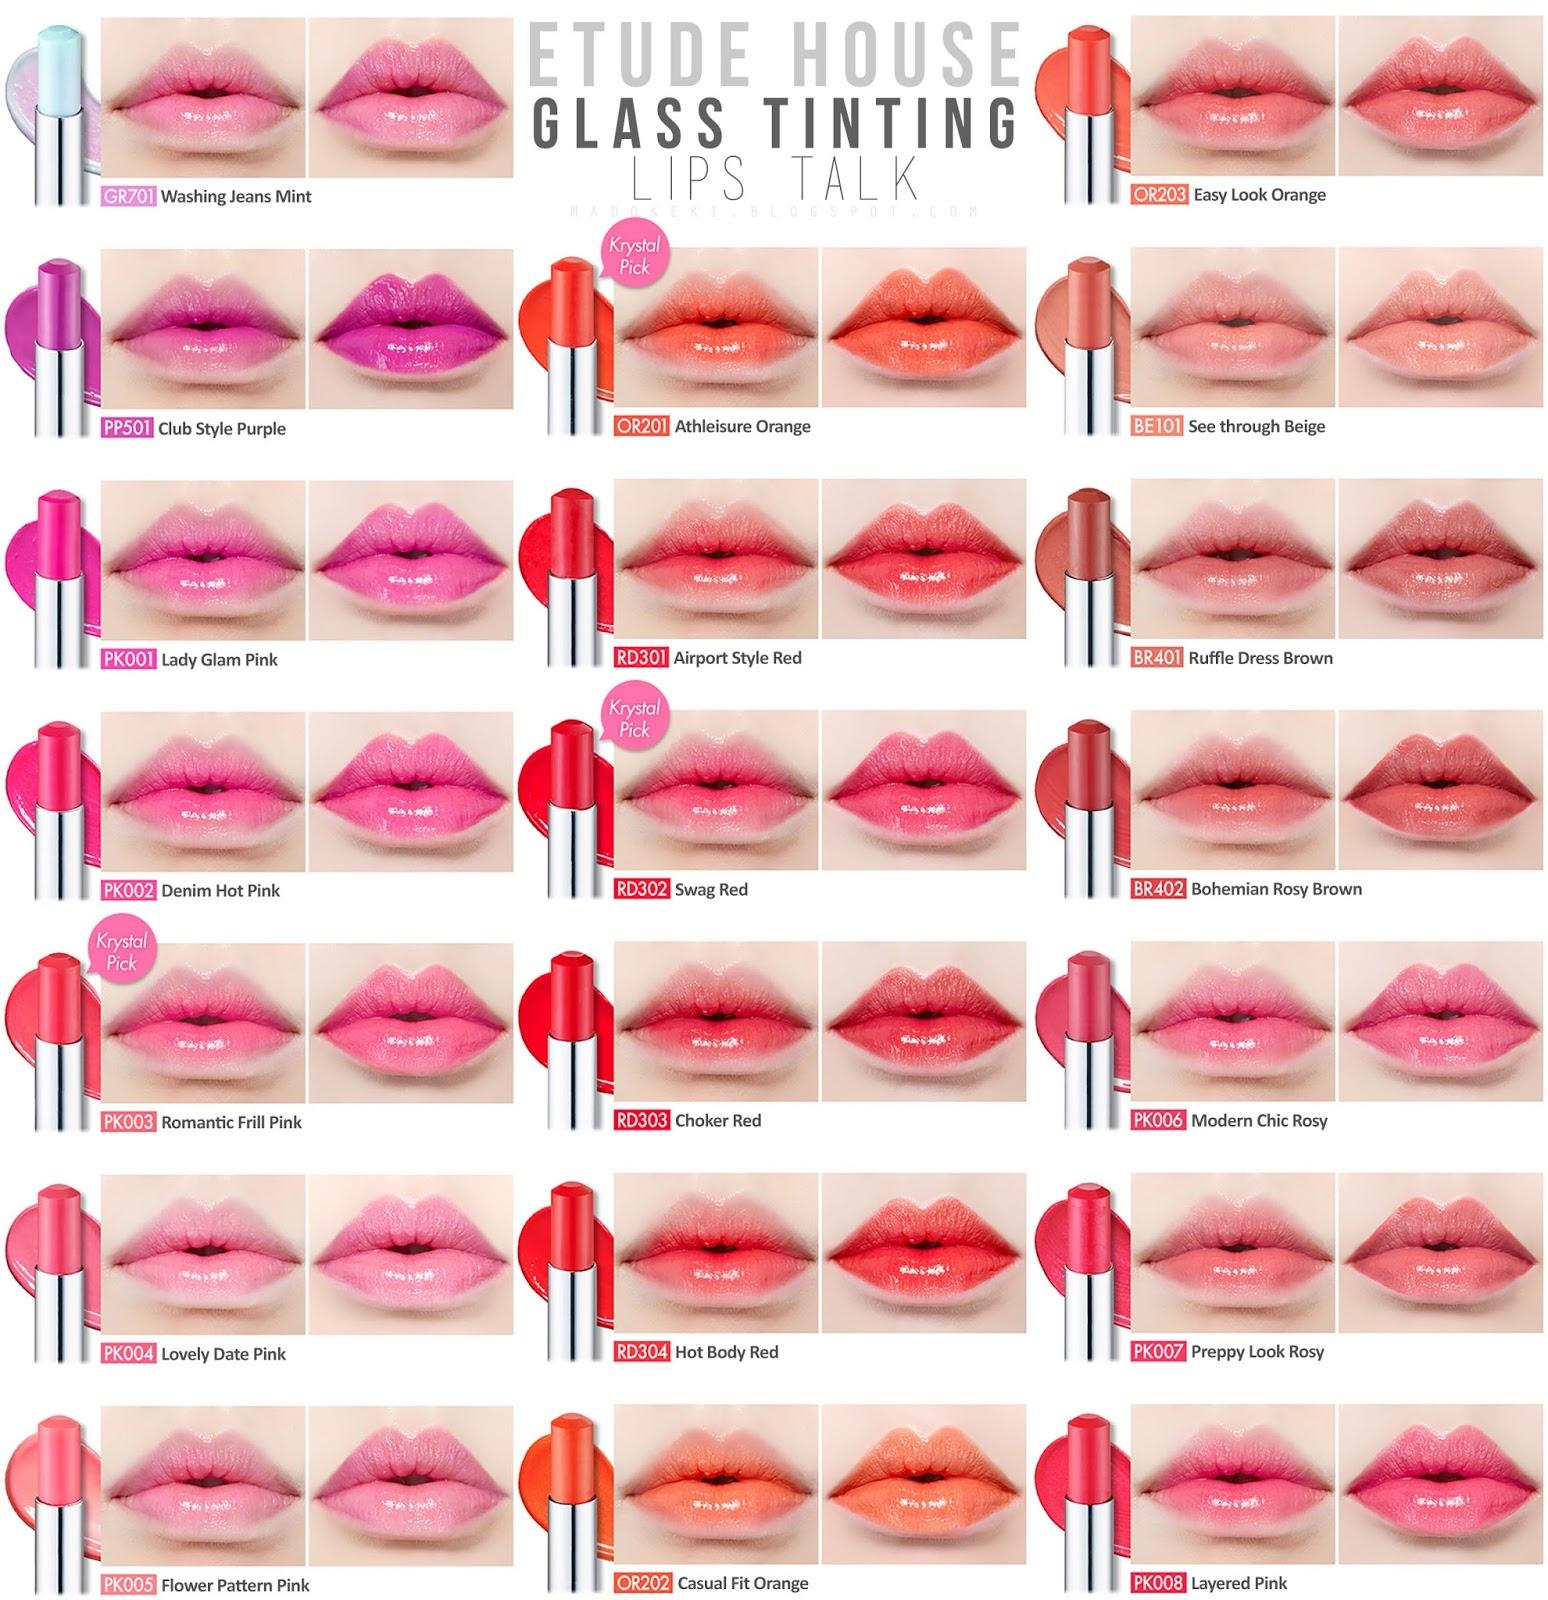 Dear My Glass Tinting Lips Talk - Color